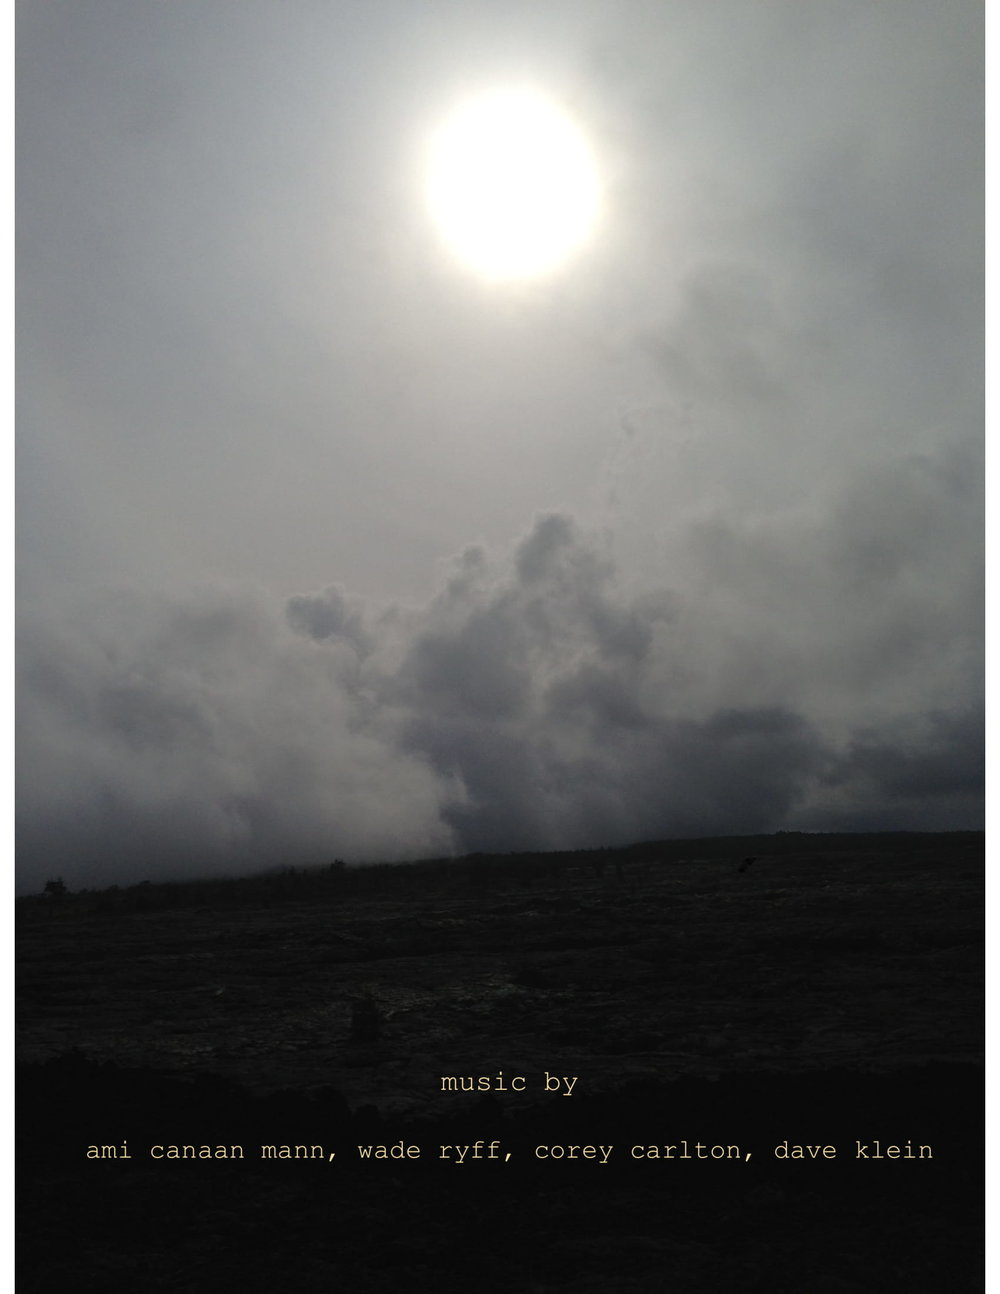 mx cover art music songs by ami canaan mann wade ryff corey carlton dave klein